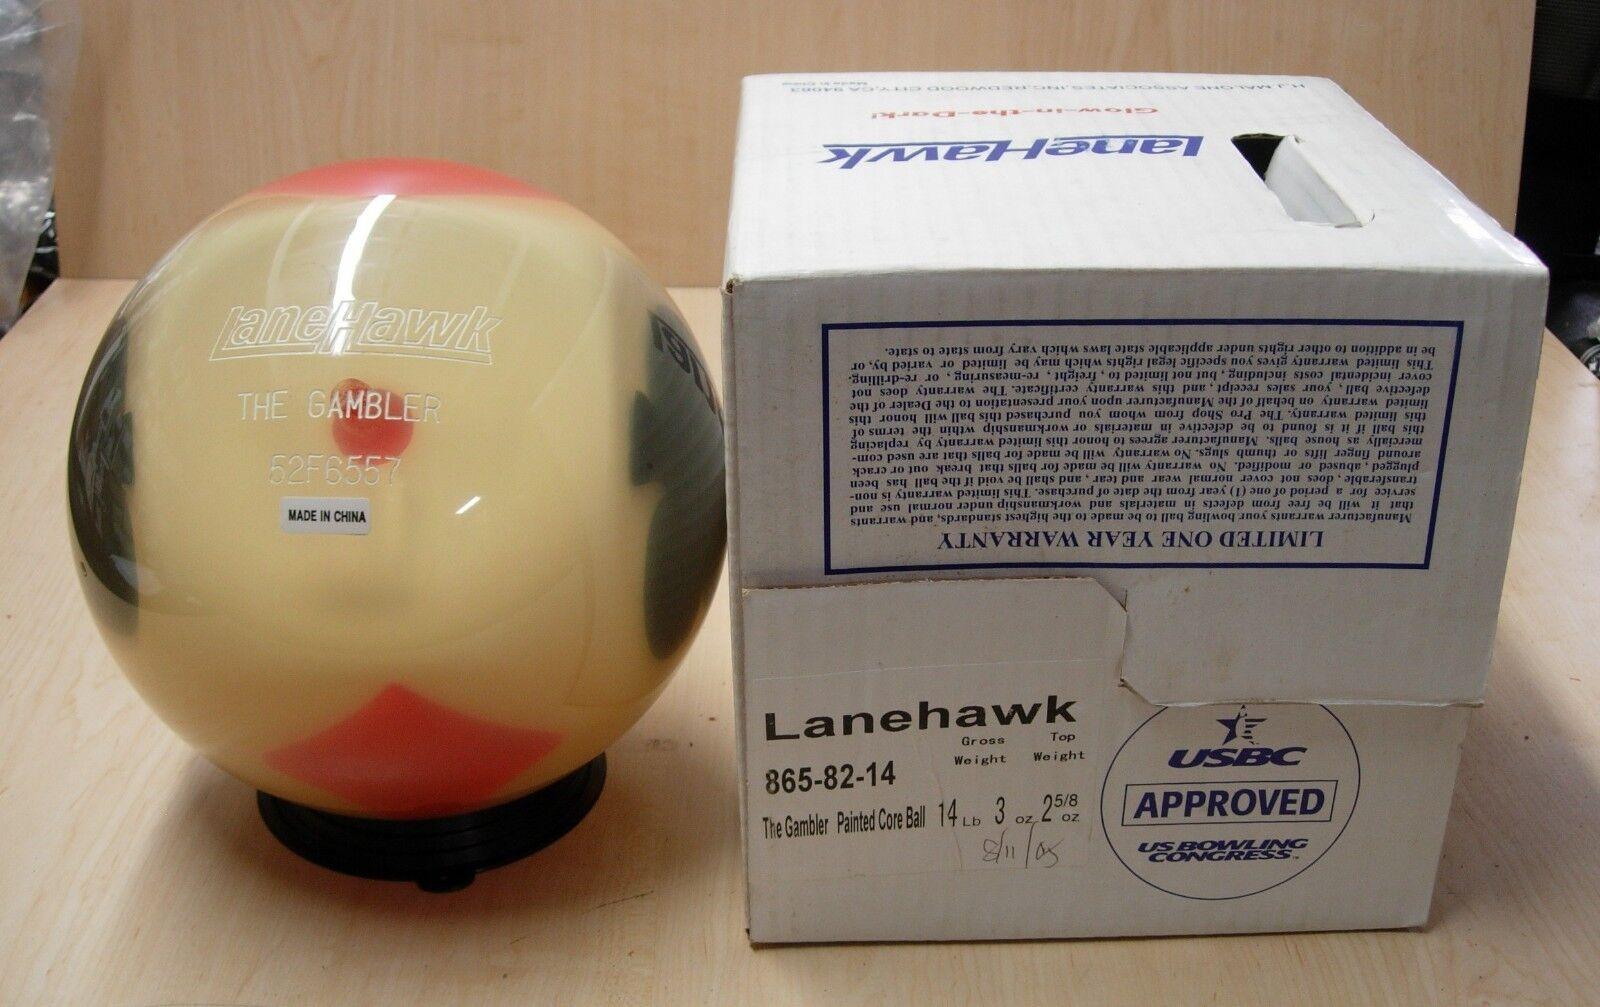 14oz TW 2-5 8 NIB Lanehawk GAMBLER Clear Bowling Ball Undrilled golden Yellow